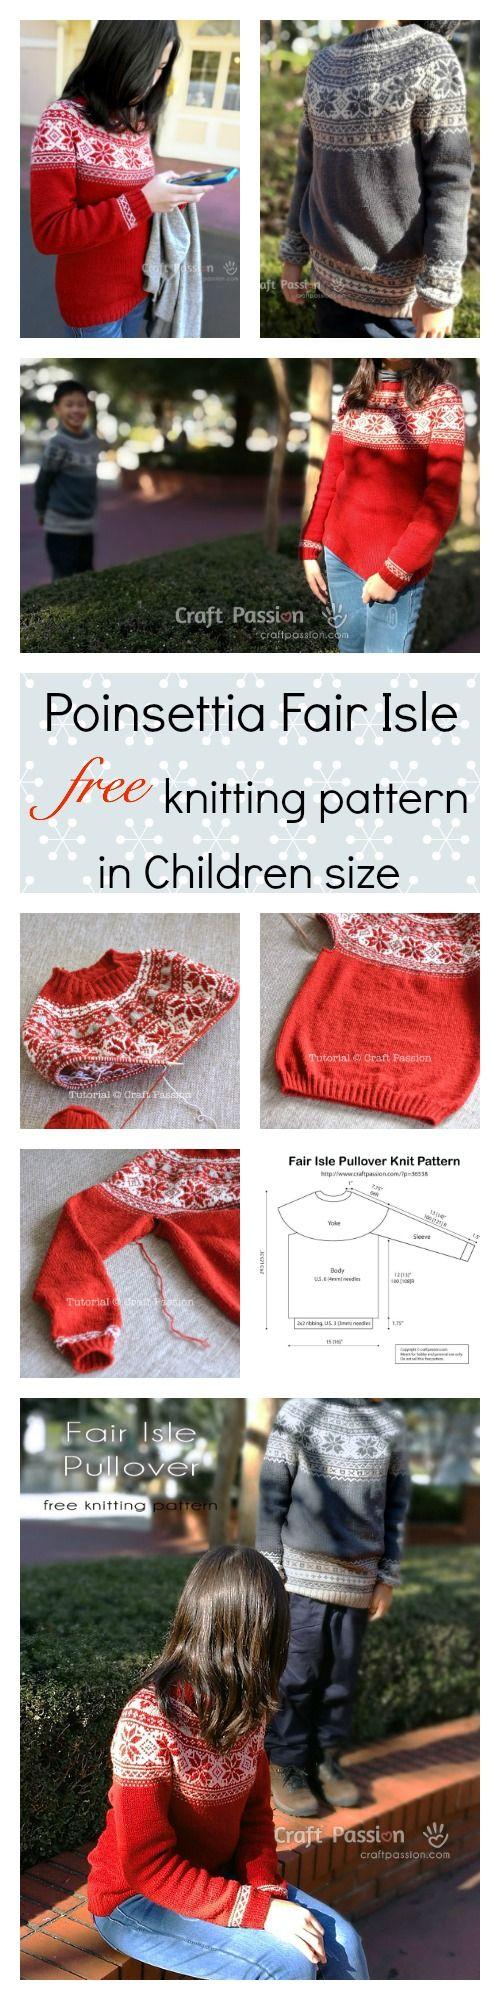 Fair Isle Pullover - Children Size - Free Knitting Pattern ...